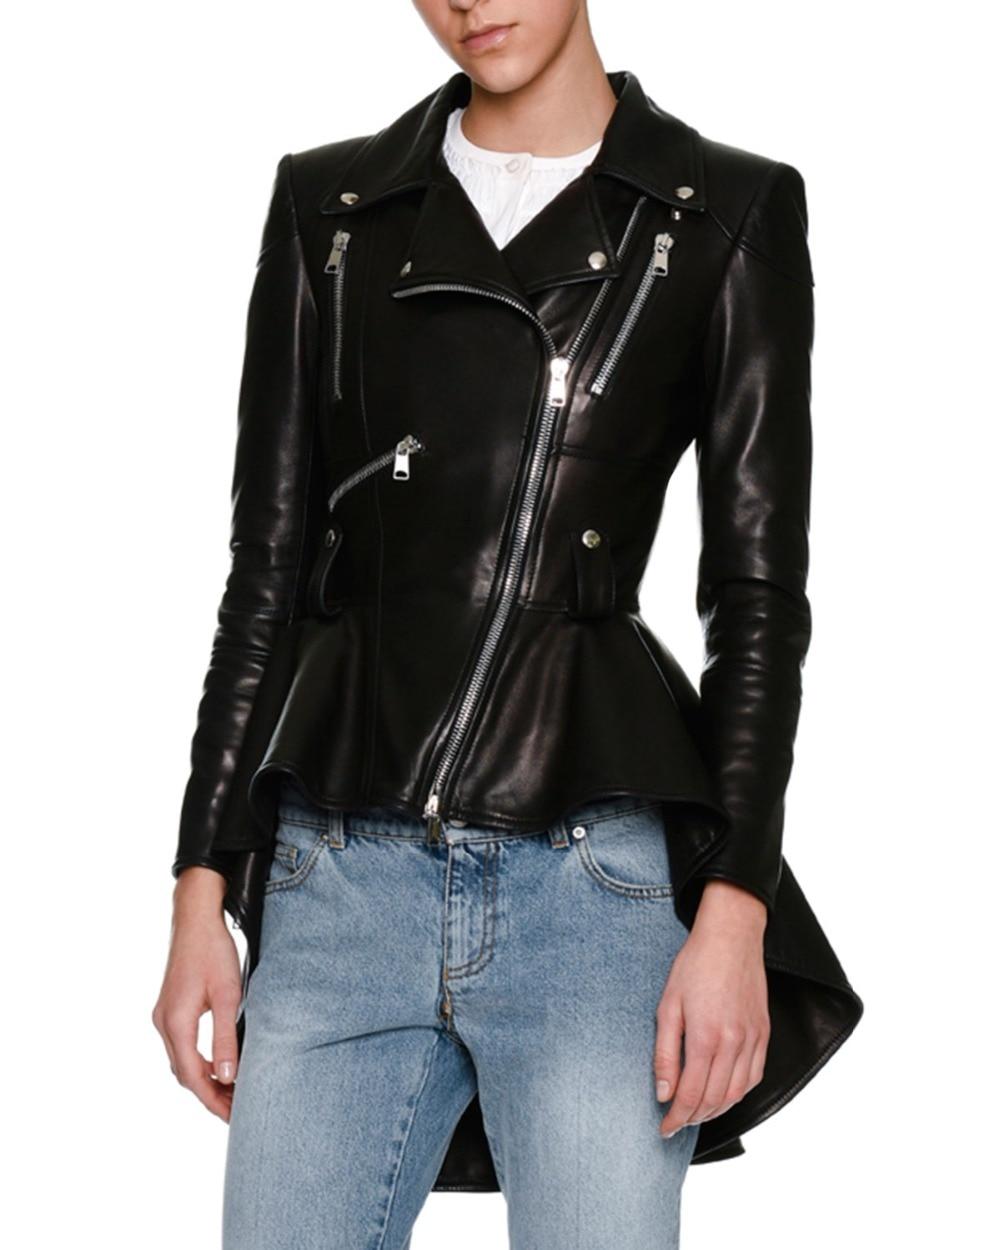 SS2018 Women s Brand notched lapels Faux Leather frock detail asymmetric zip front High low hem